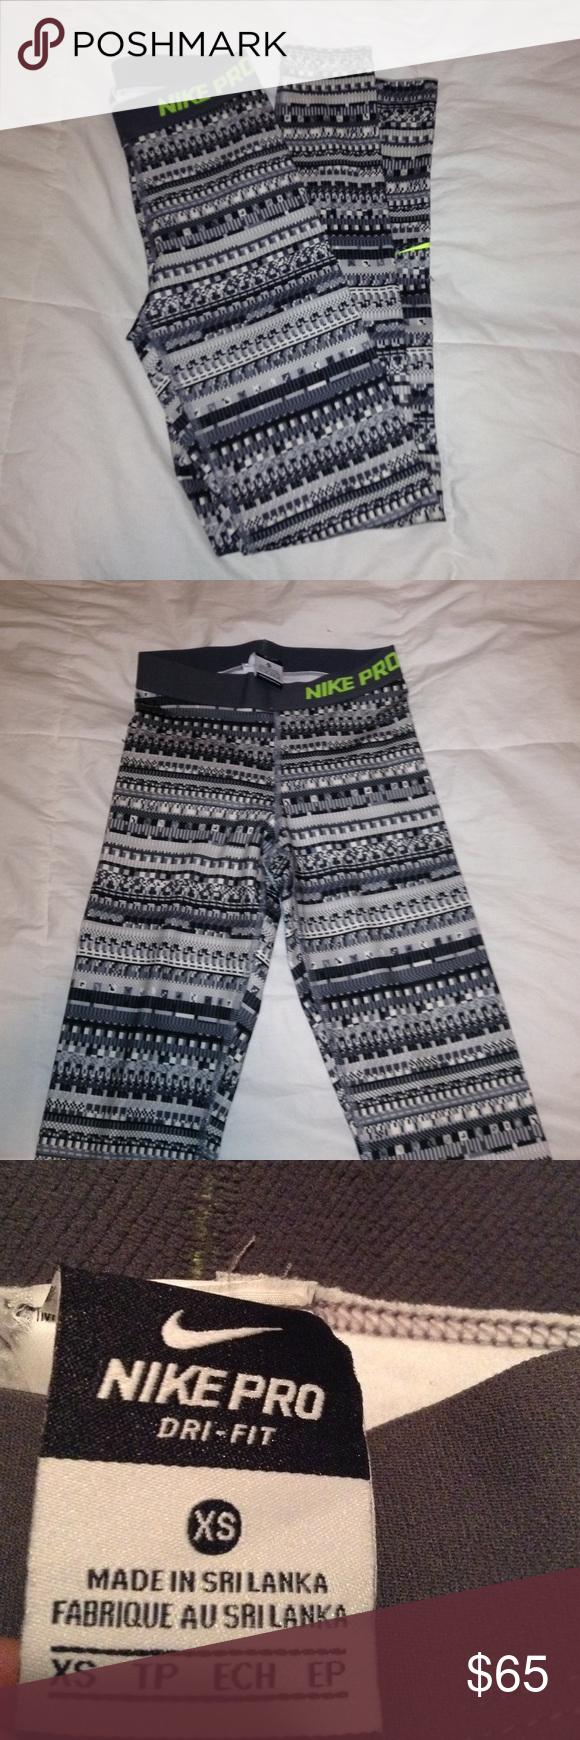 b04a99cc22b92 Tribal Nike Pro fleece lined leggings Tribal print Nike Pro fleece lined  leggings. New without tags! Nike Pants Leggings